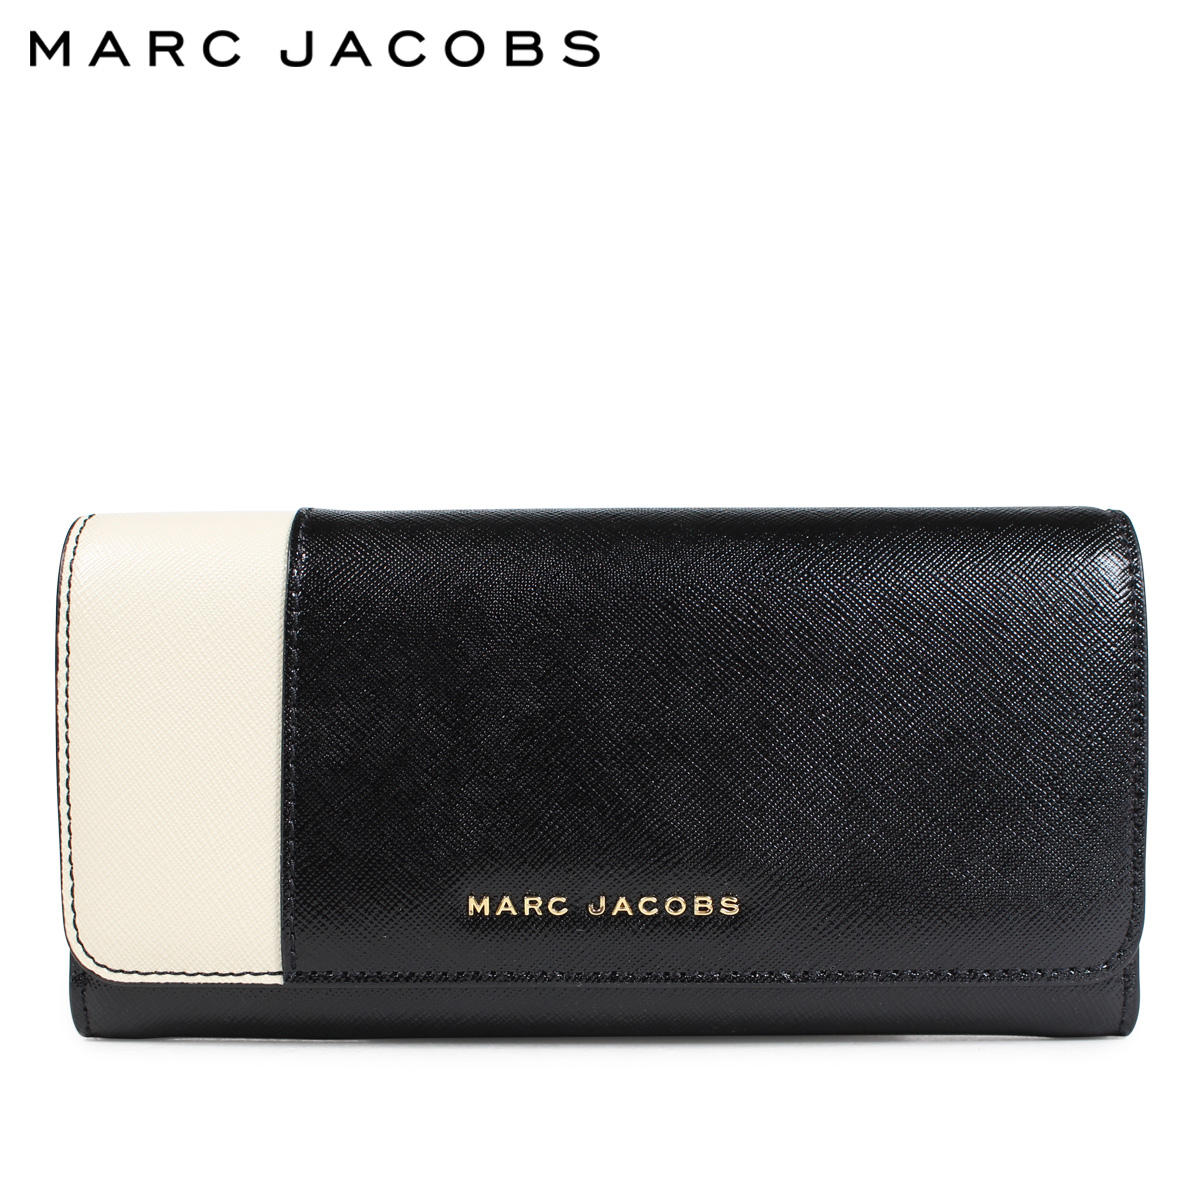 MARC JACOBS マークジェイコブス 財布 長財布 レディース レザー SAFFIANO METAL LETTERS FLAP CONTINENTAL ブラック M0013590